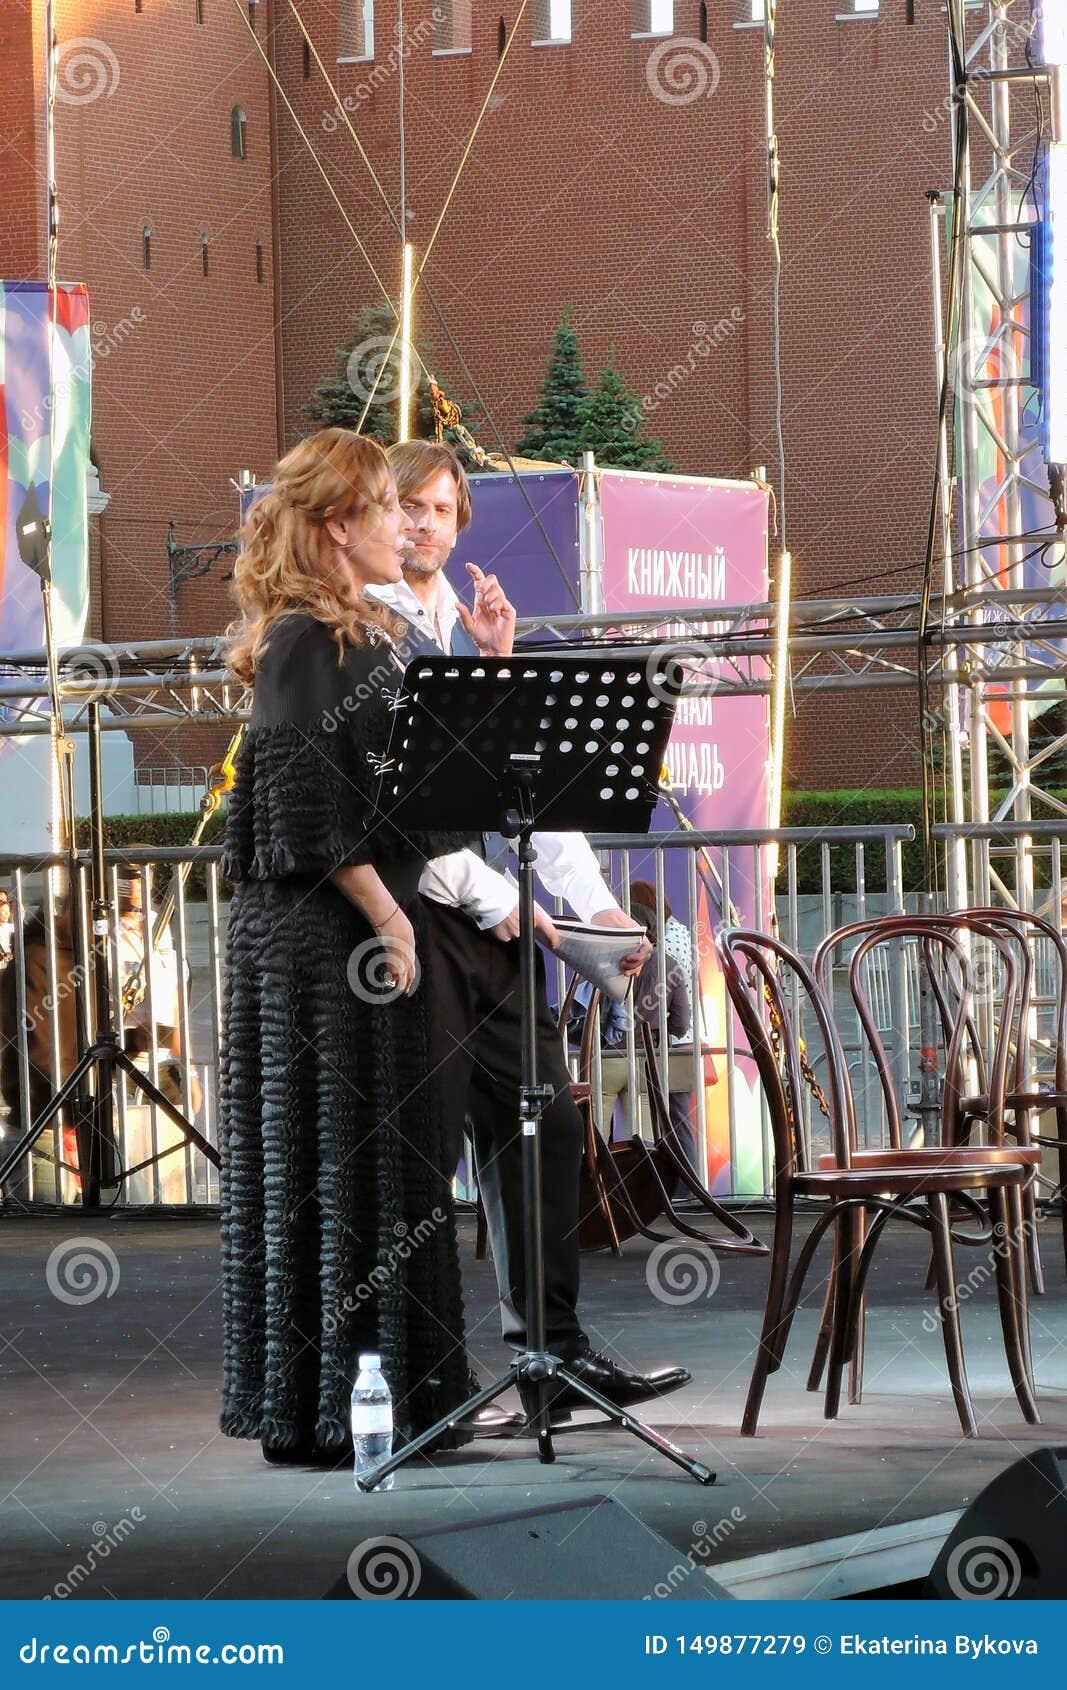 Sati Spivakova at public concert. The Red Square Book Fair in Moscow.